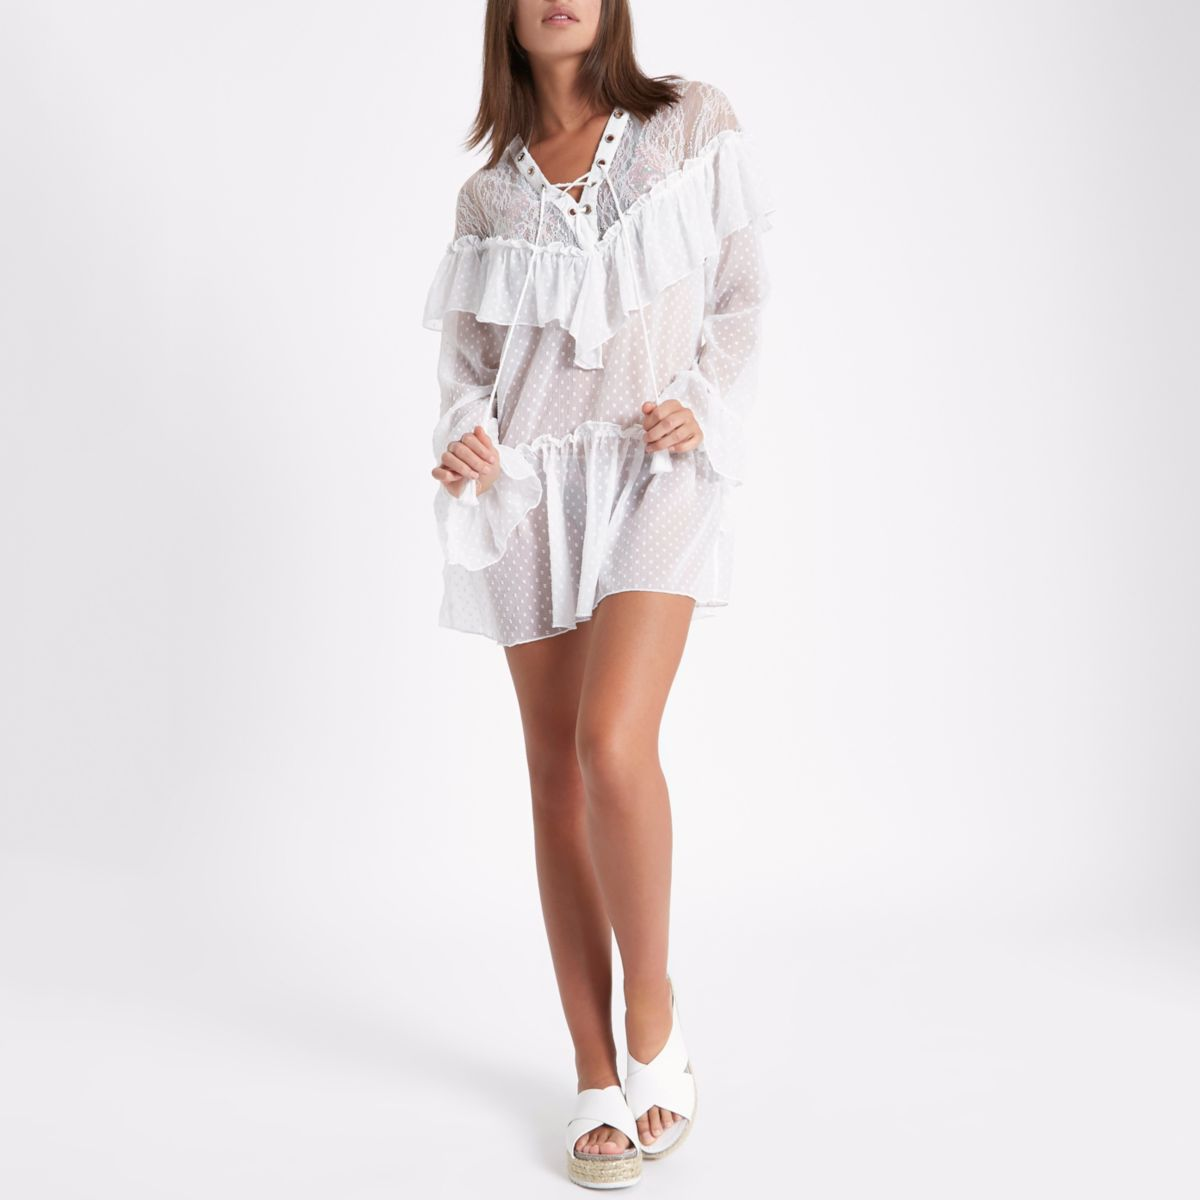 White lace dobby mesh frill beach dress